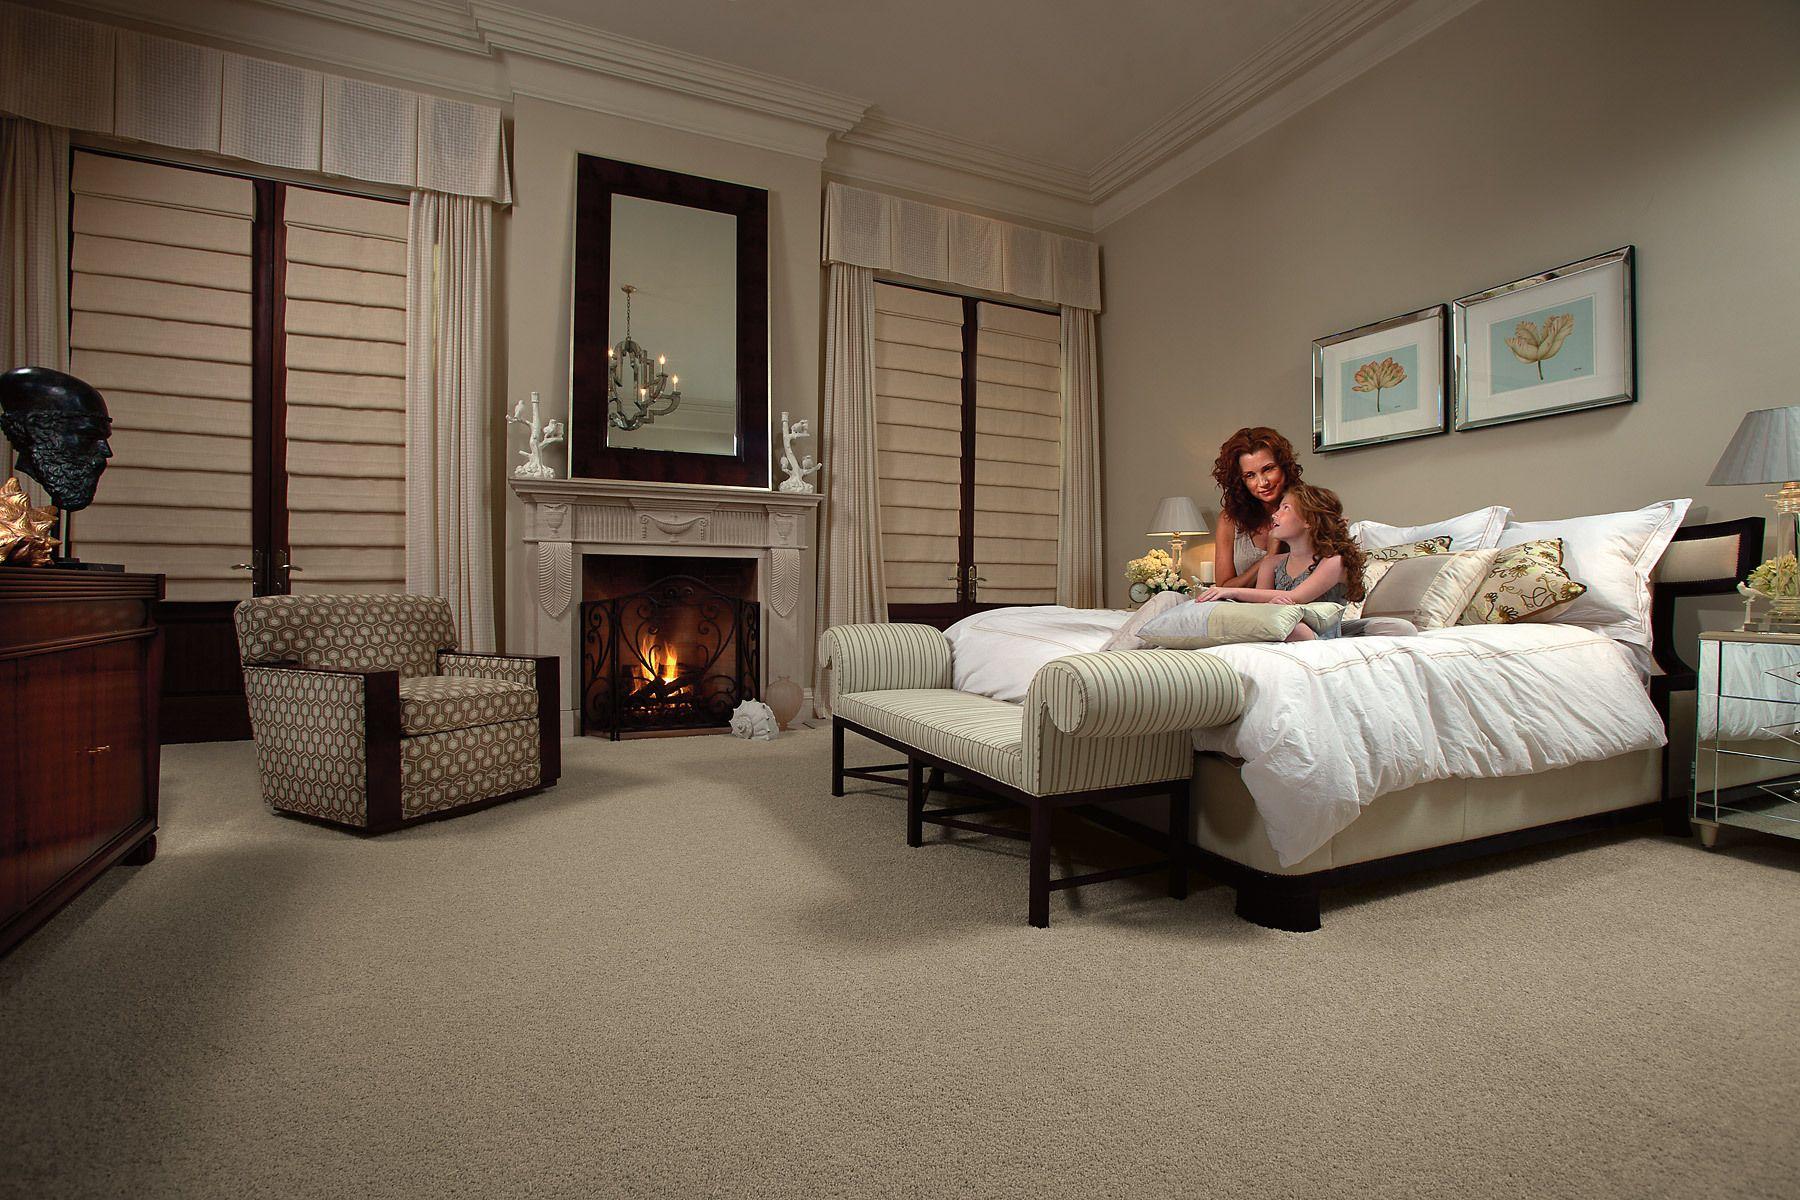 1karastan_duncan_bedroom_1091_edit_rgb_warm.jpg